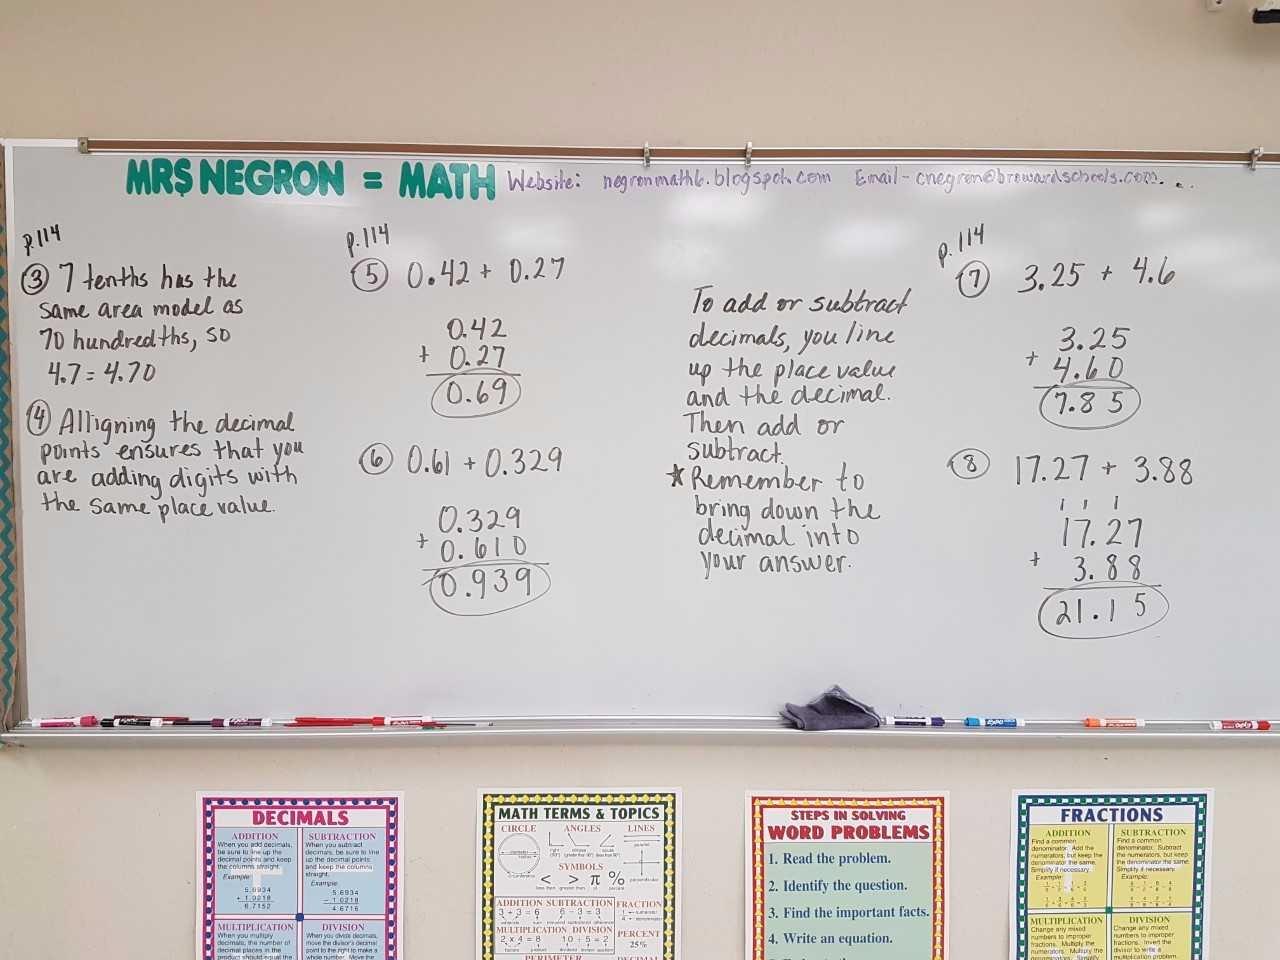 6th Math Worksheet Adding Decimals